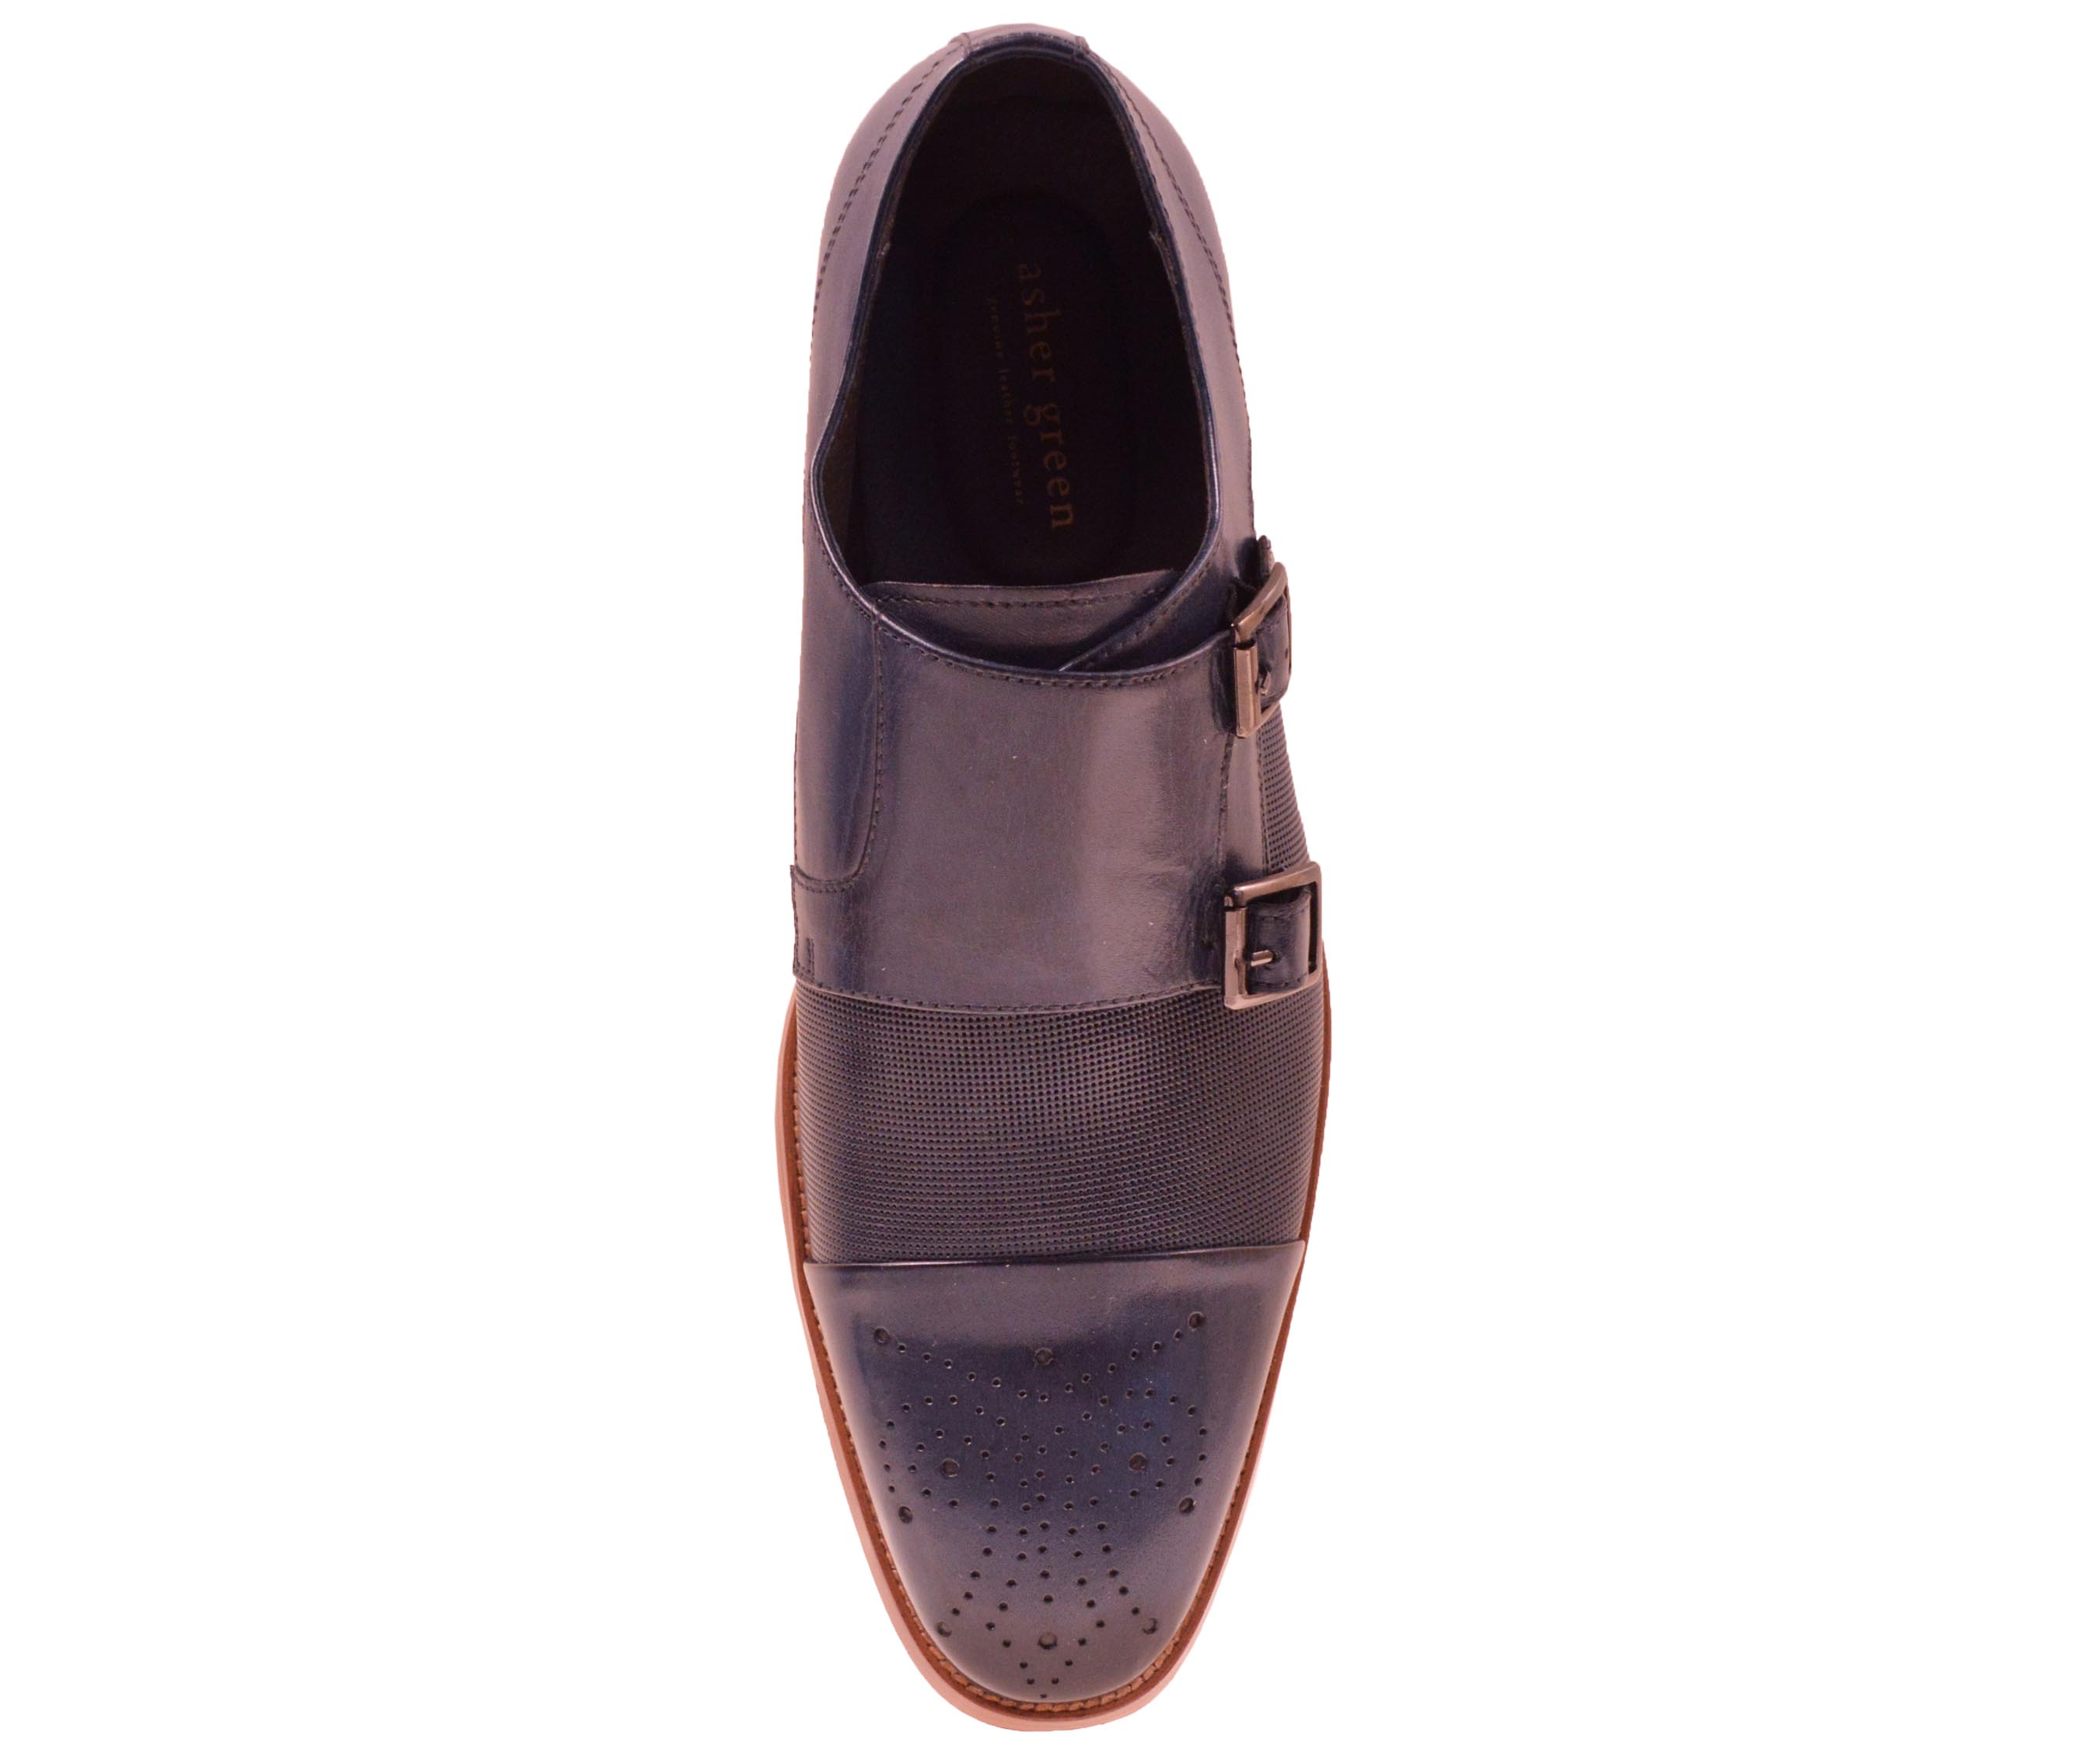 072ac24ab85d Asher Green - Asher Green Mens Dress Shoes